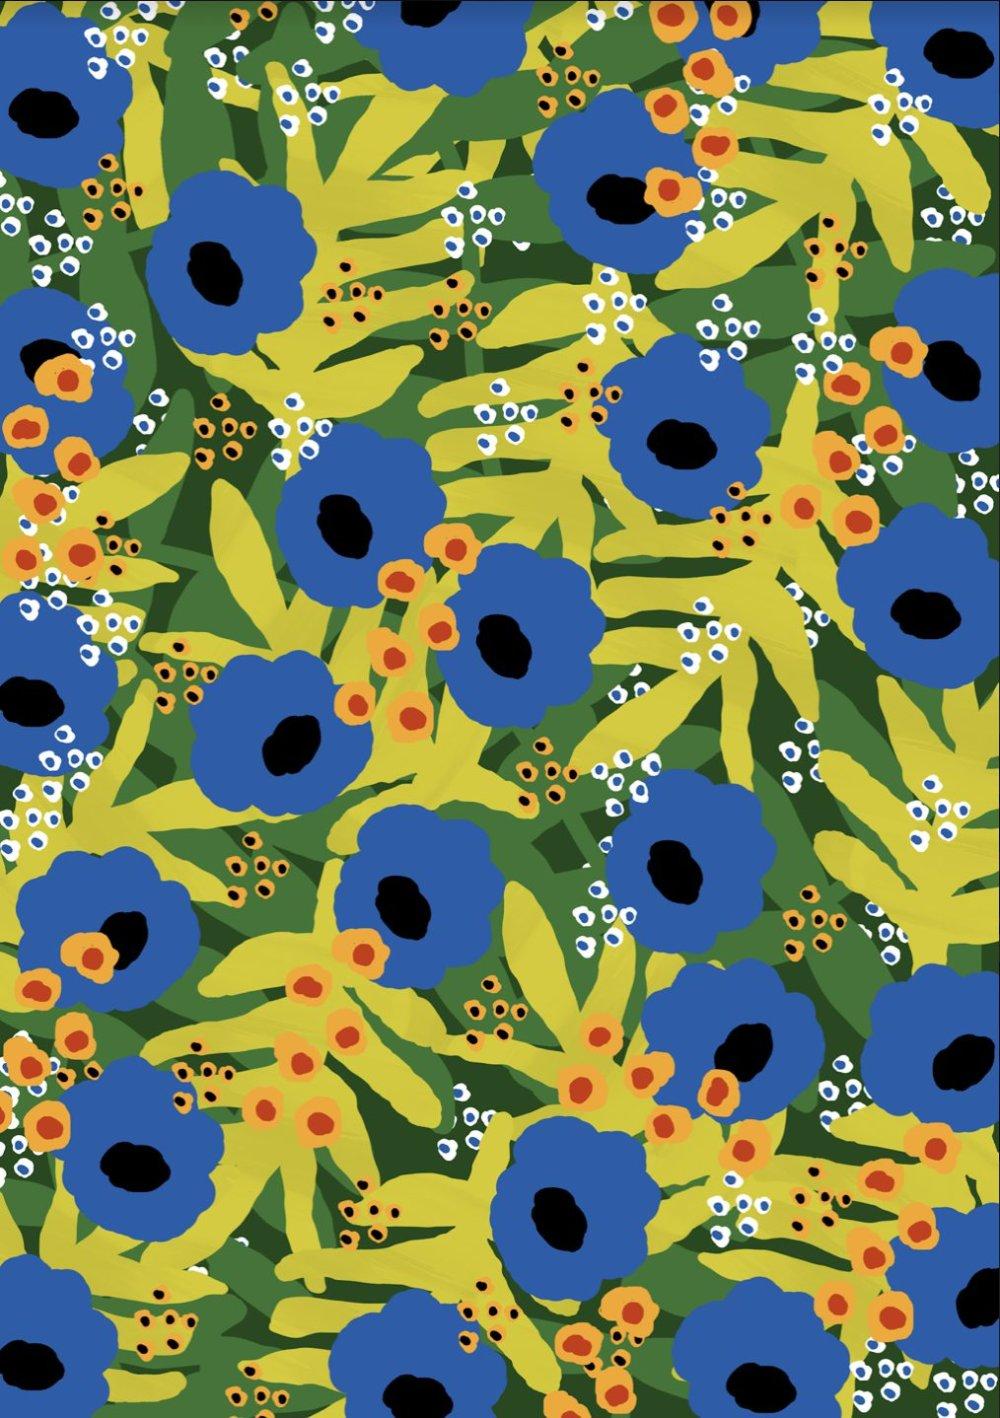 Gorgeous And Colorful Floral Illustrations By Rafaela Mascaro 7